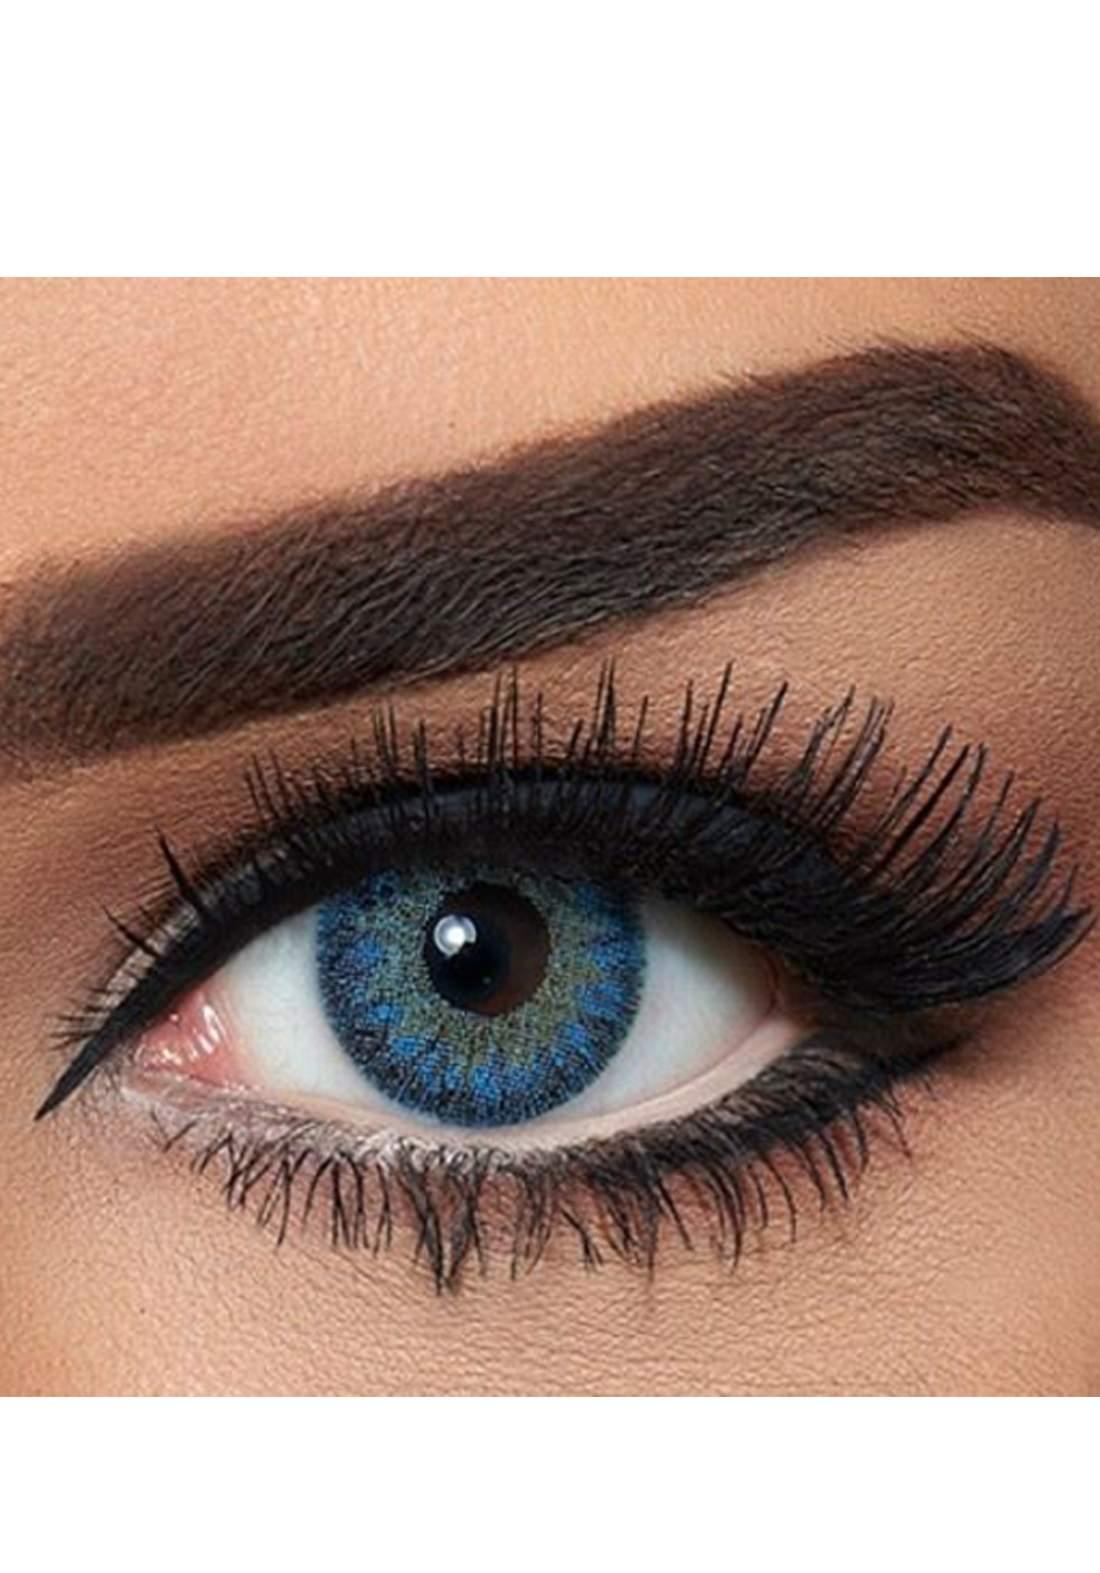 Bella Classic 301023 Contact Lenses 3 Months Use Natural - Coll Blue No.24 عدسات لاصقة